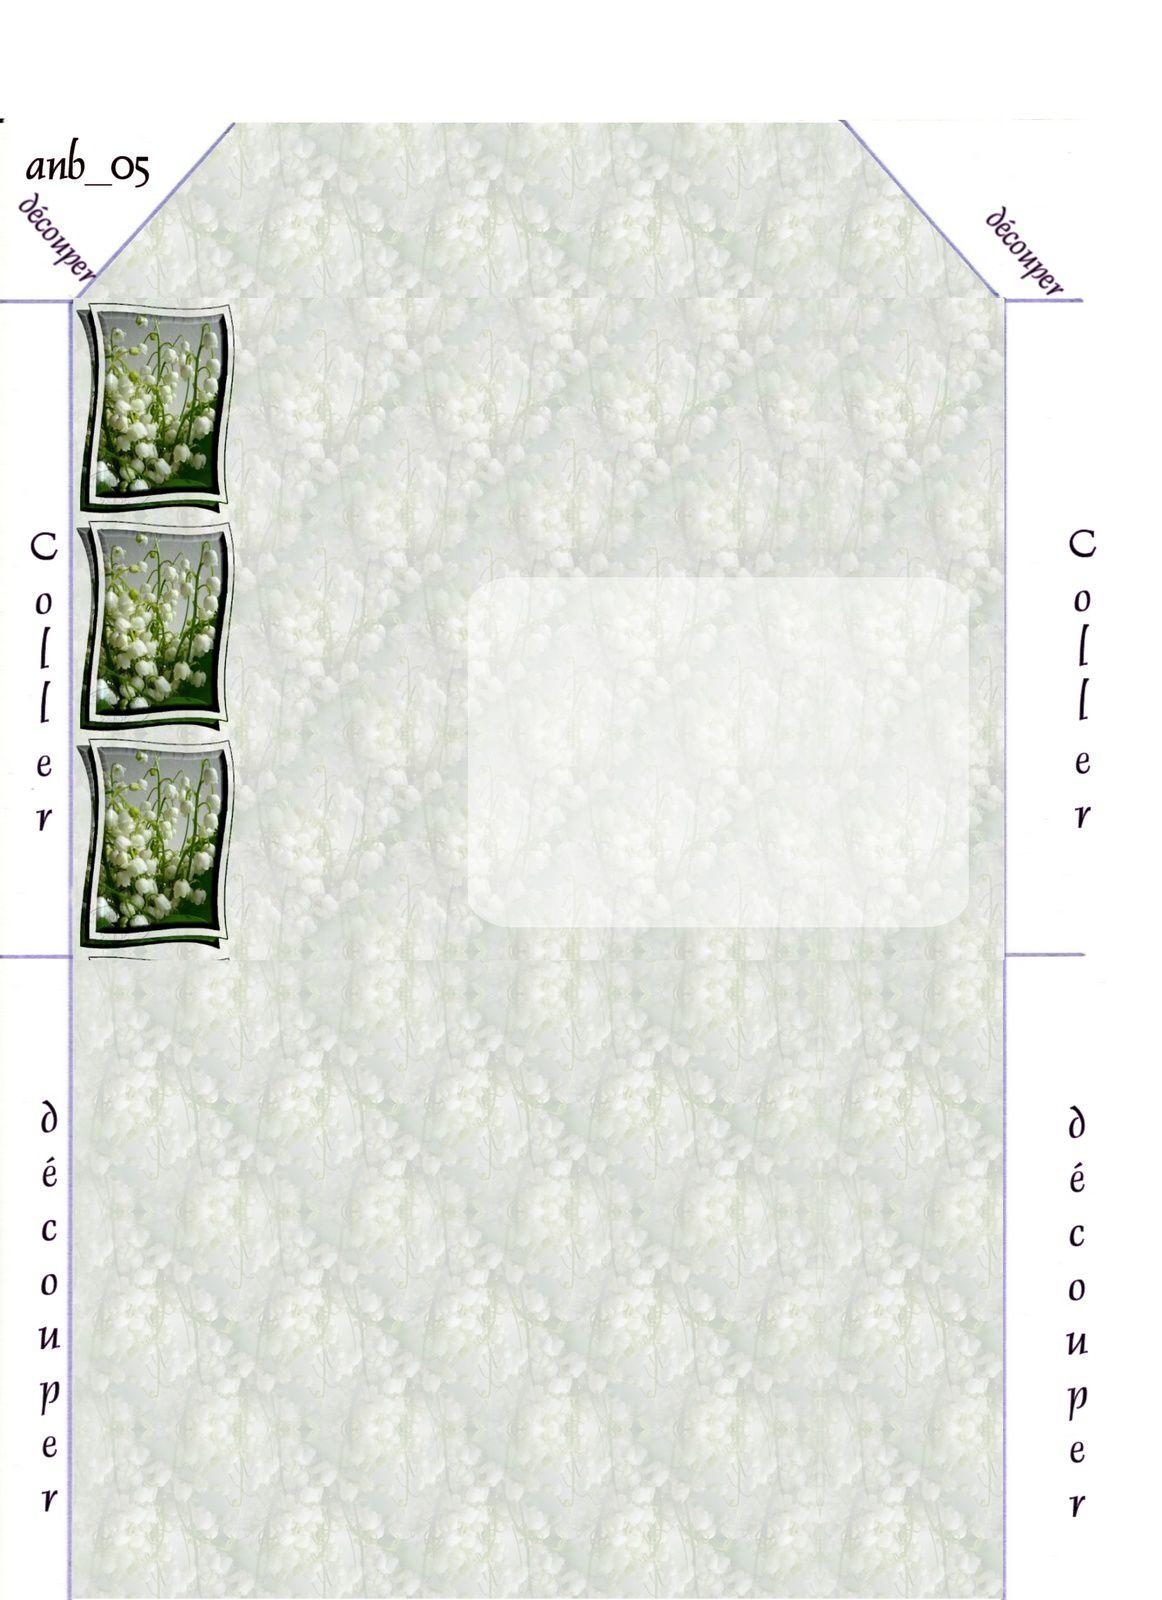 Muguet Incredimail &amp&#x3B; Papier A4 h l &amp&#x3B; outlook &amp&#x3B; enveloppe &amp&#x3B; 2 cartes A5 fleurs_muguet_67